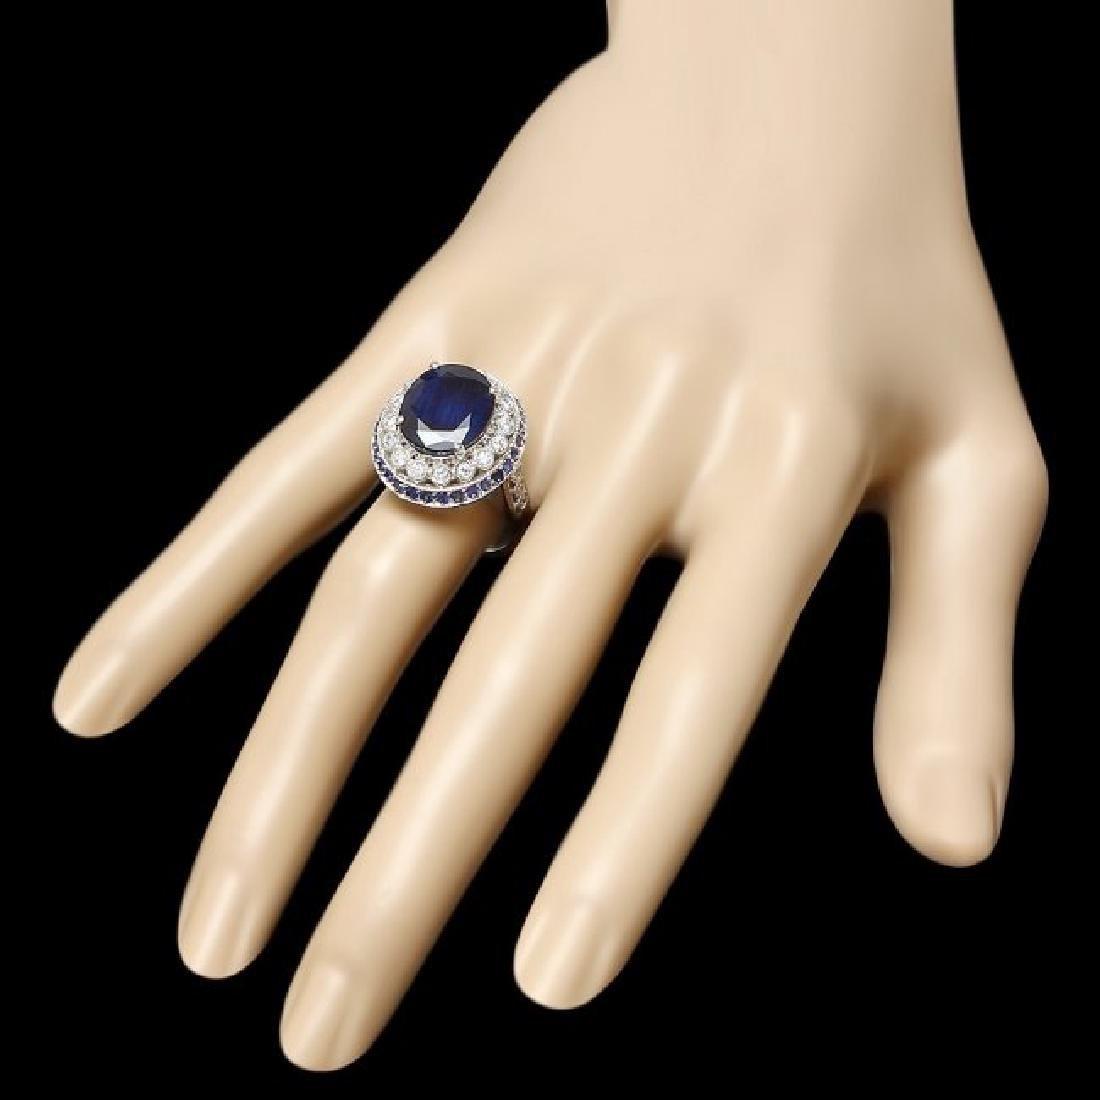 14k Gold 9.35ct Sapphire 0.55ct Diamond Ring - 3